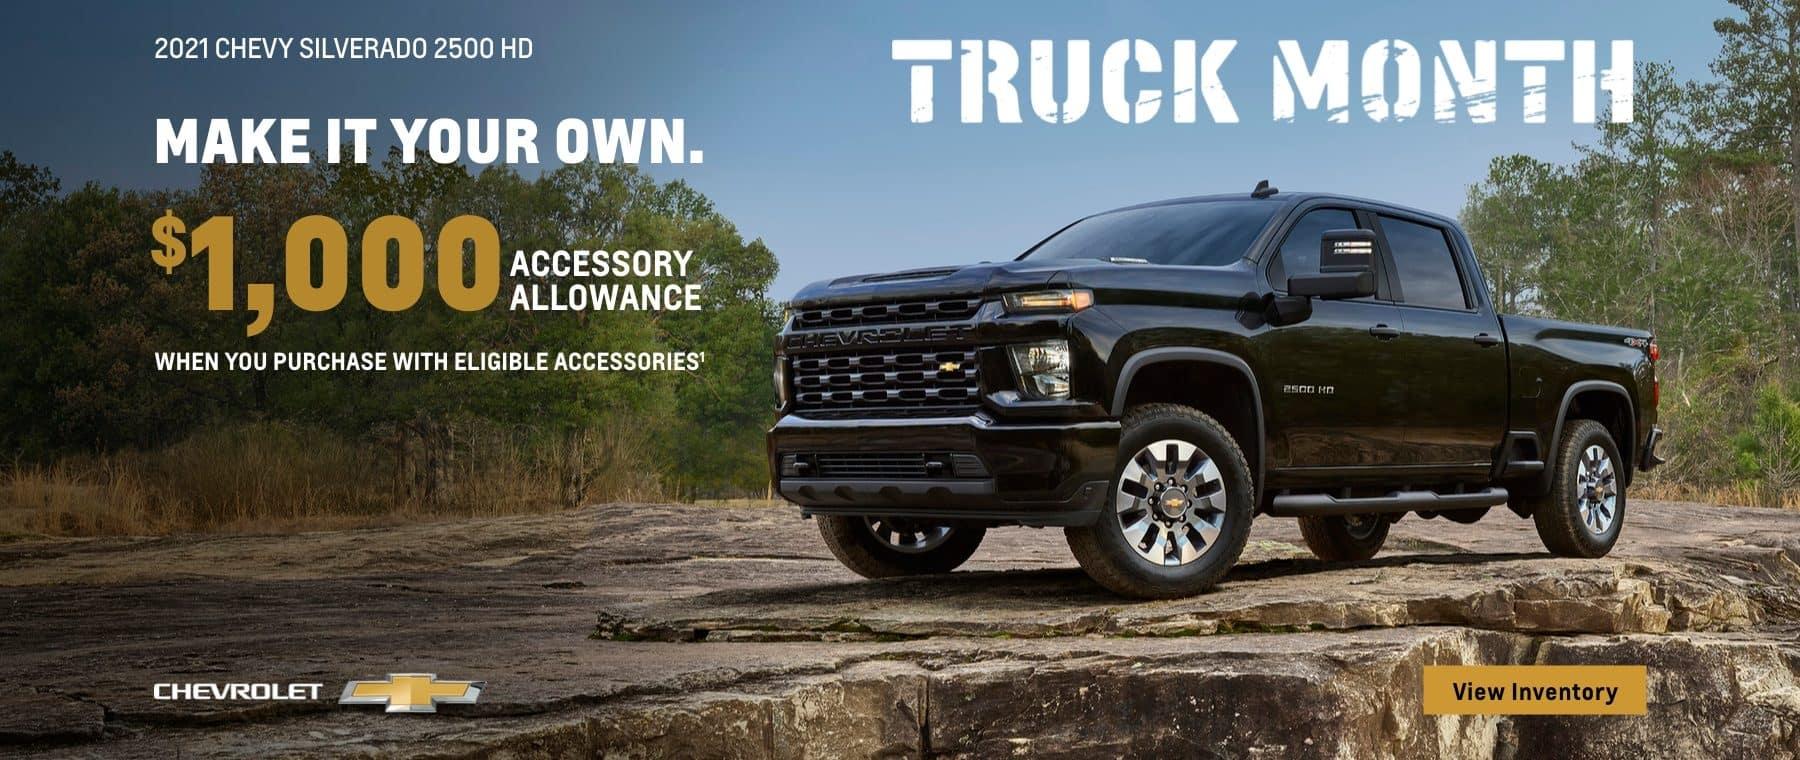 Truck Month: Make it town own $1,000 accessory allowance